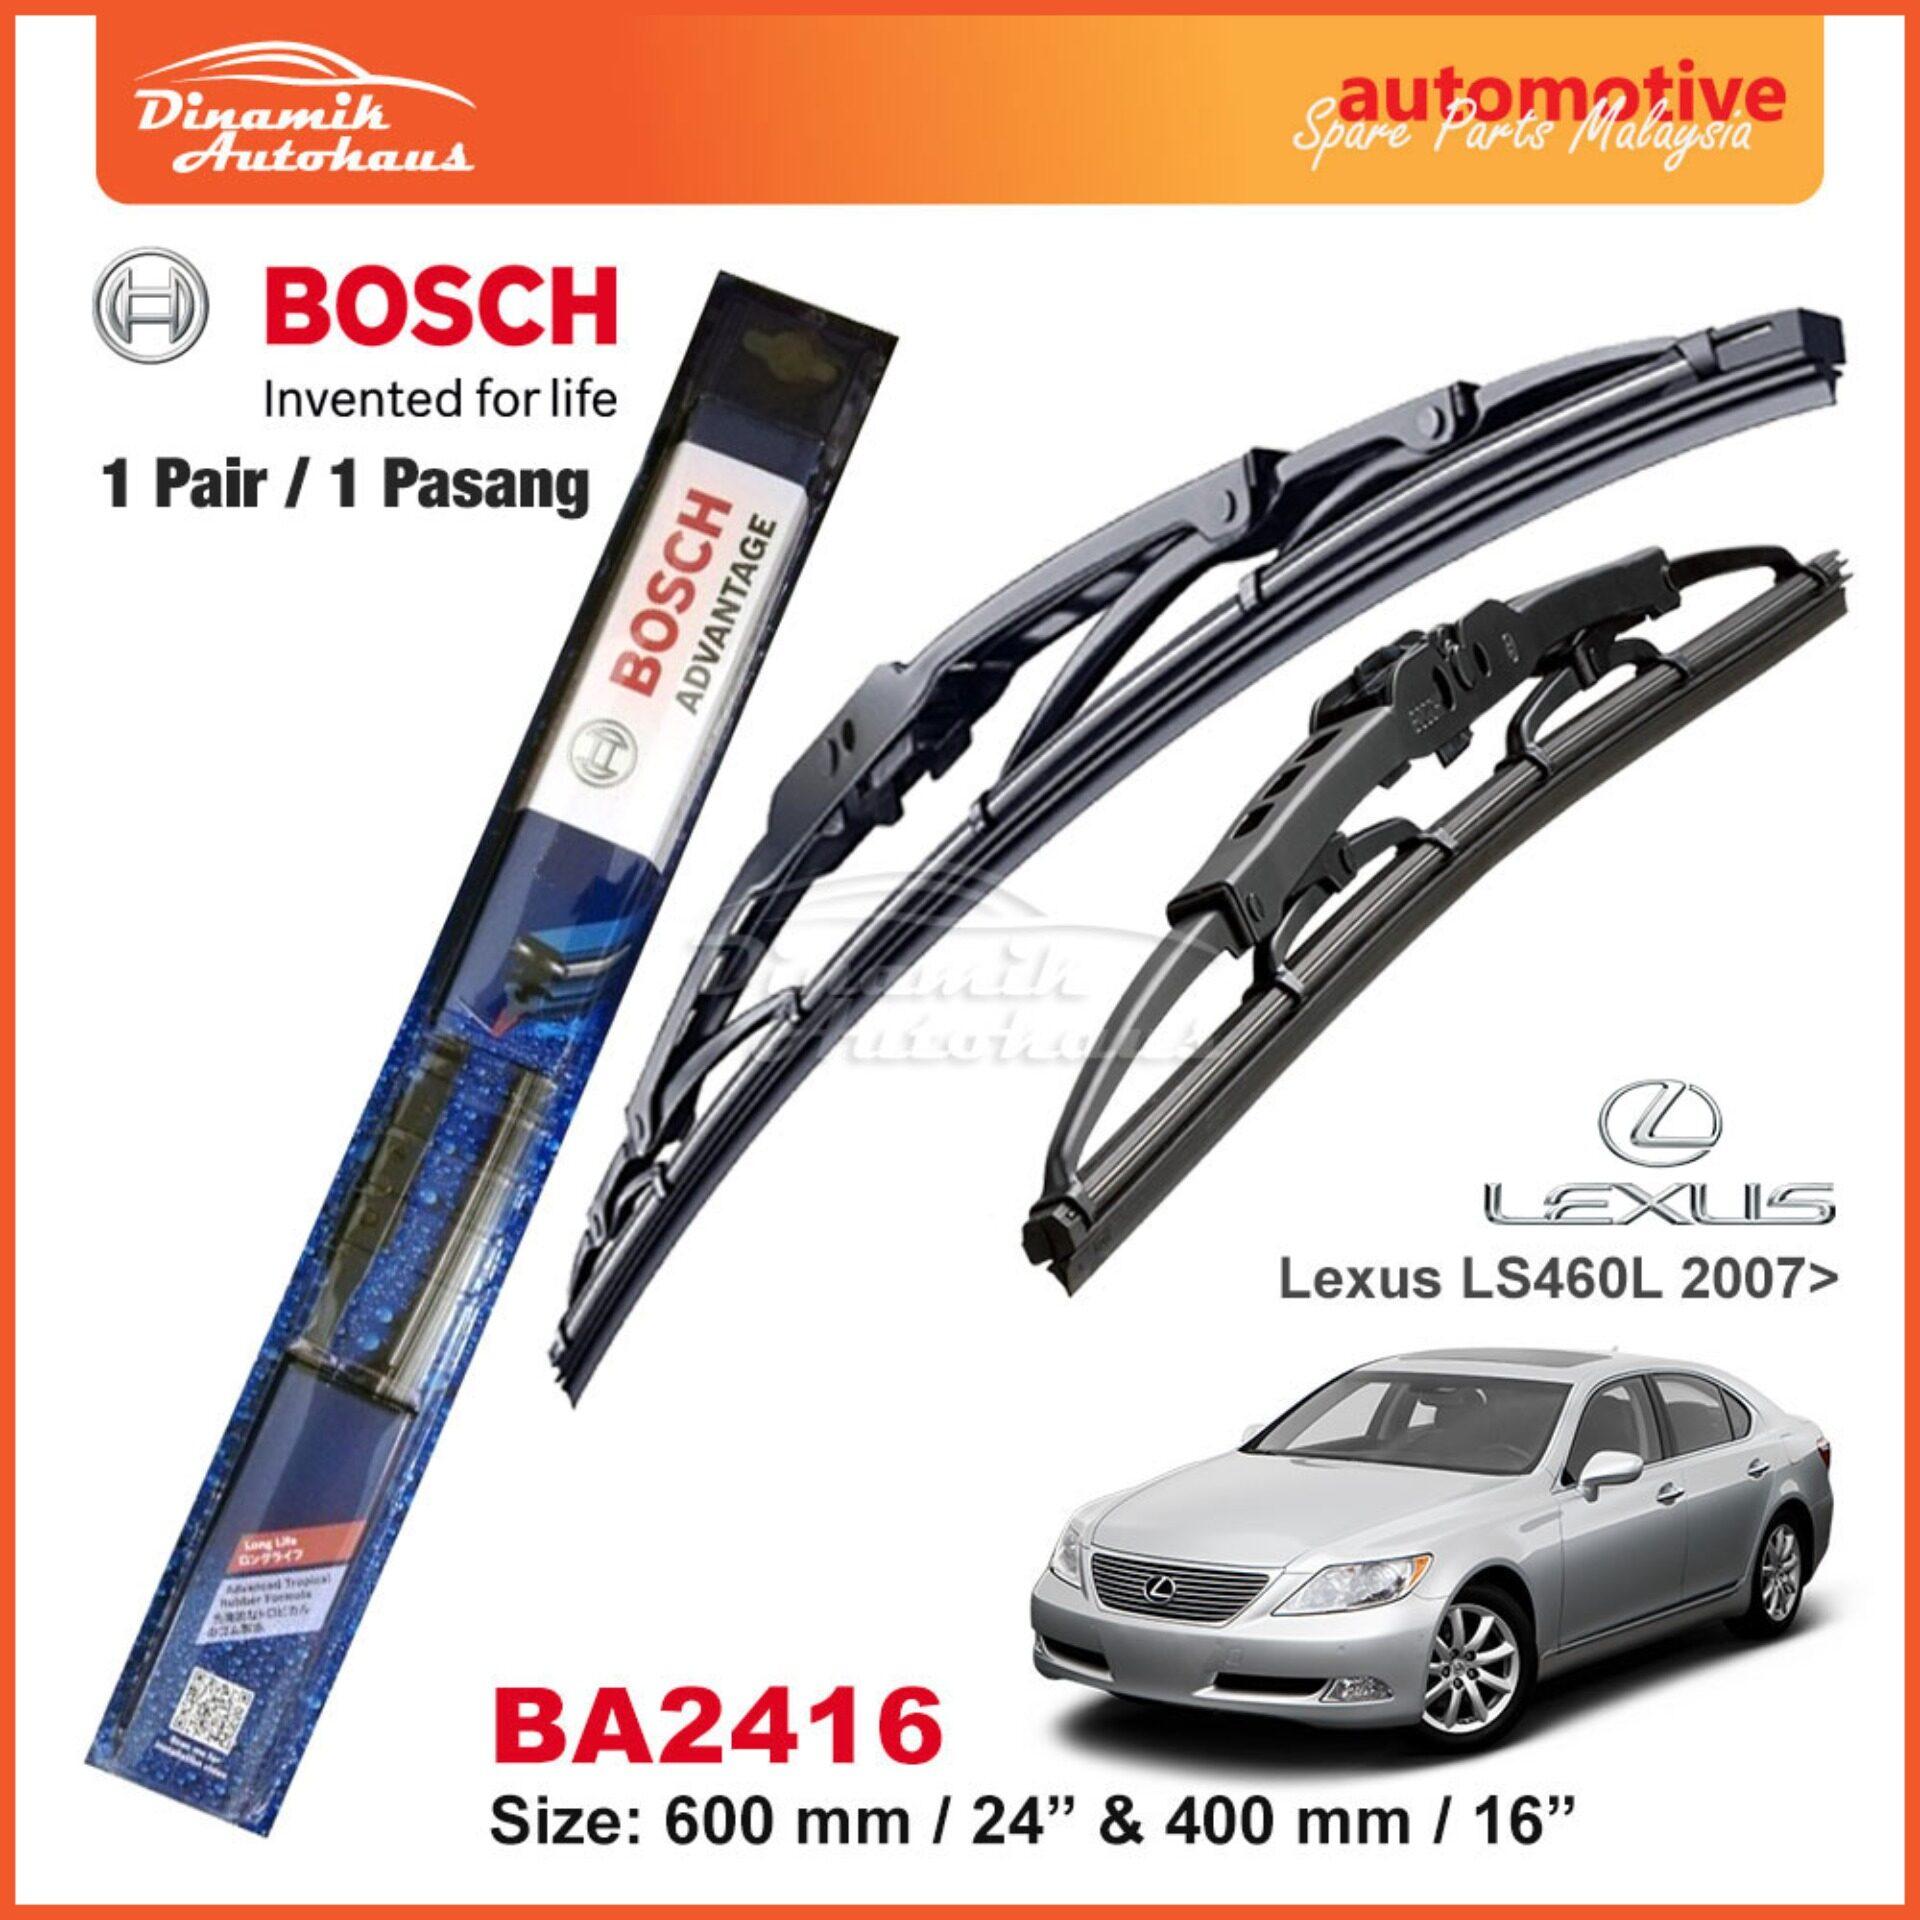 Toyota Lexus LS460L Car Year 2007+ Windshield Wiper Blade 24  / 16  Bosch Advantage BA2416